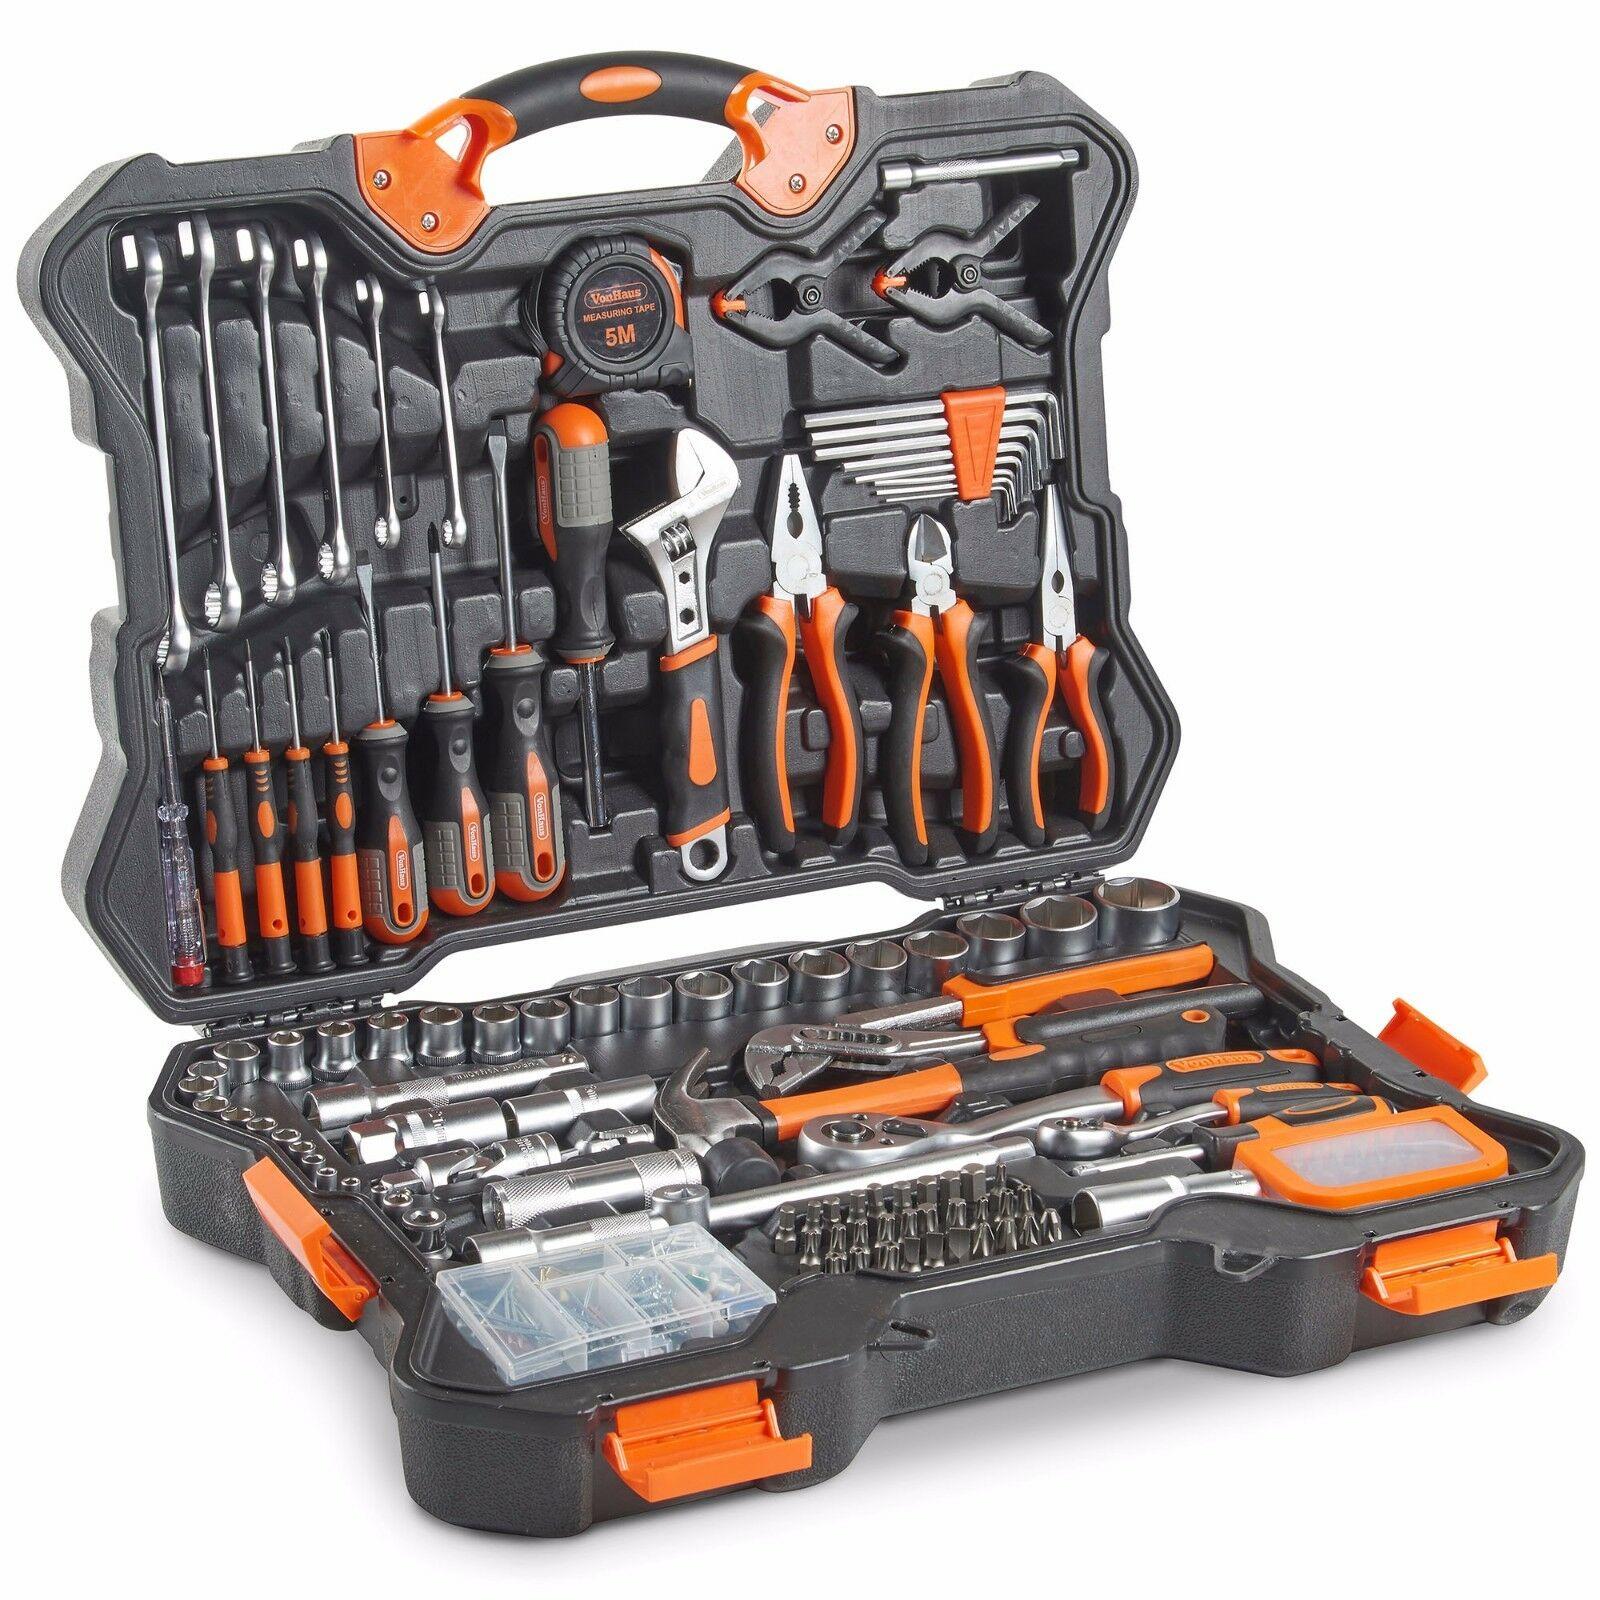 VonHaus 256pc Premium Household Hand Tool, Bits & Socket Wrench Set £68.39 at domu-uk eBay